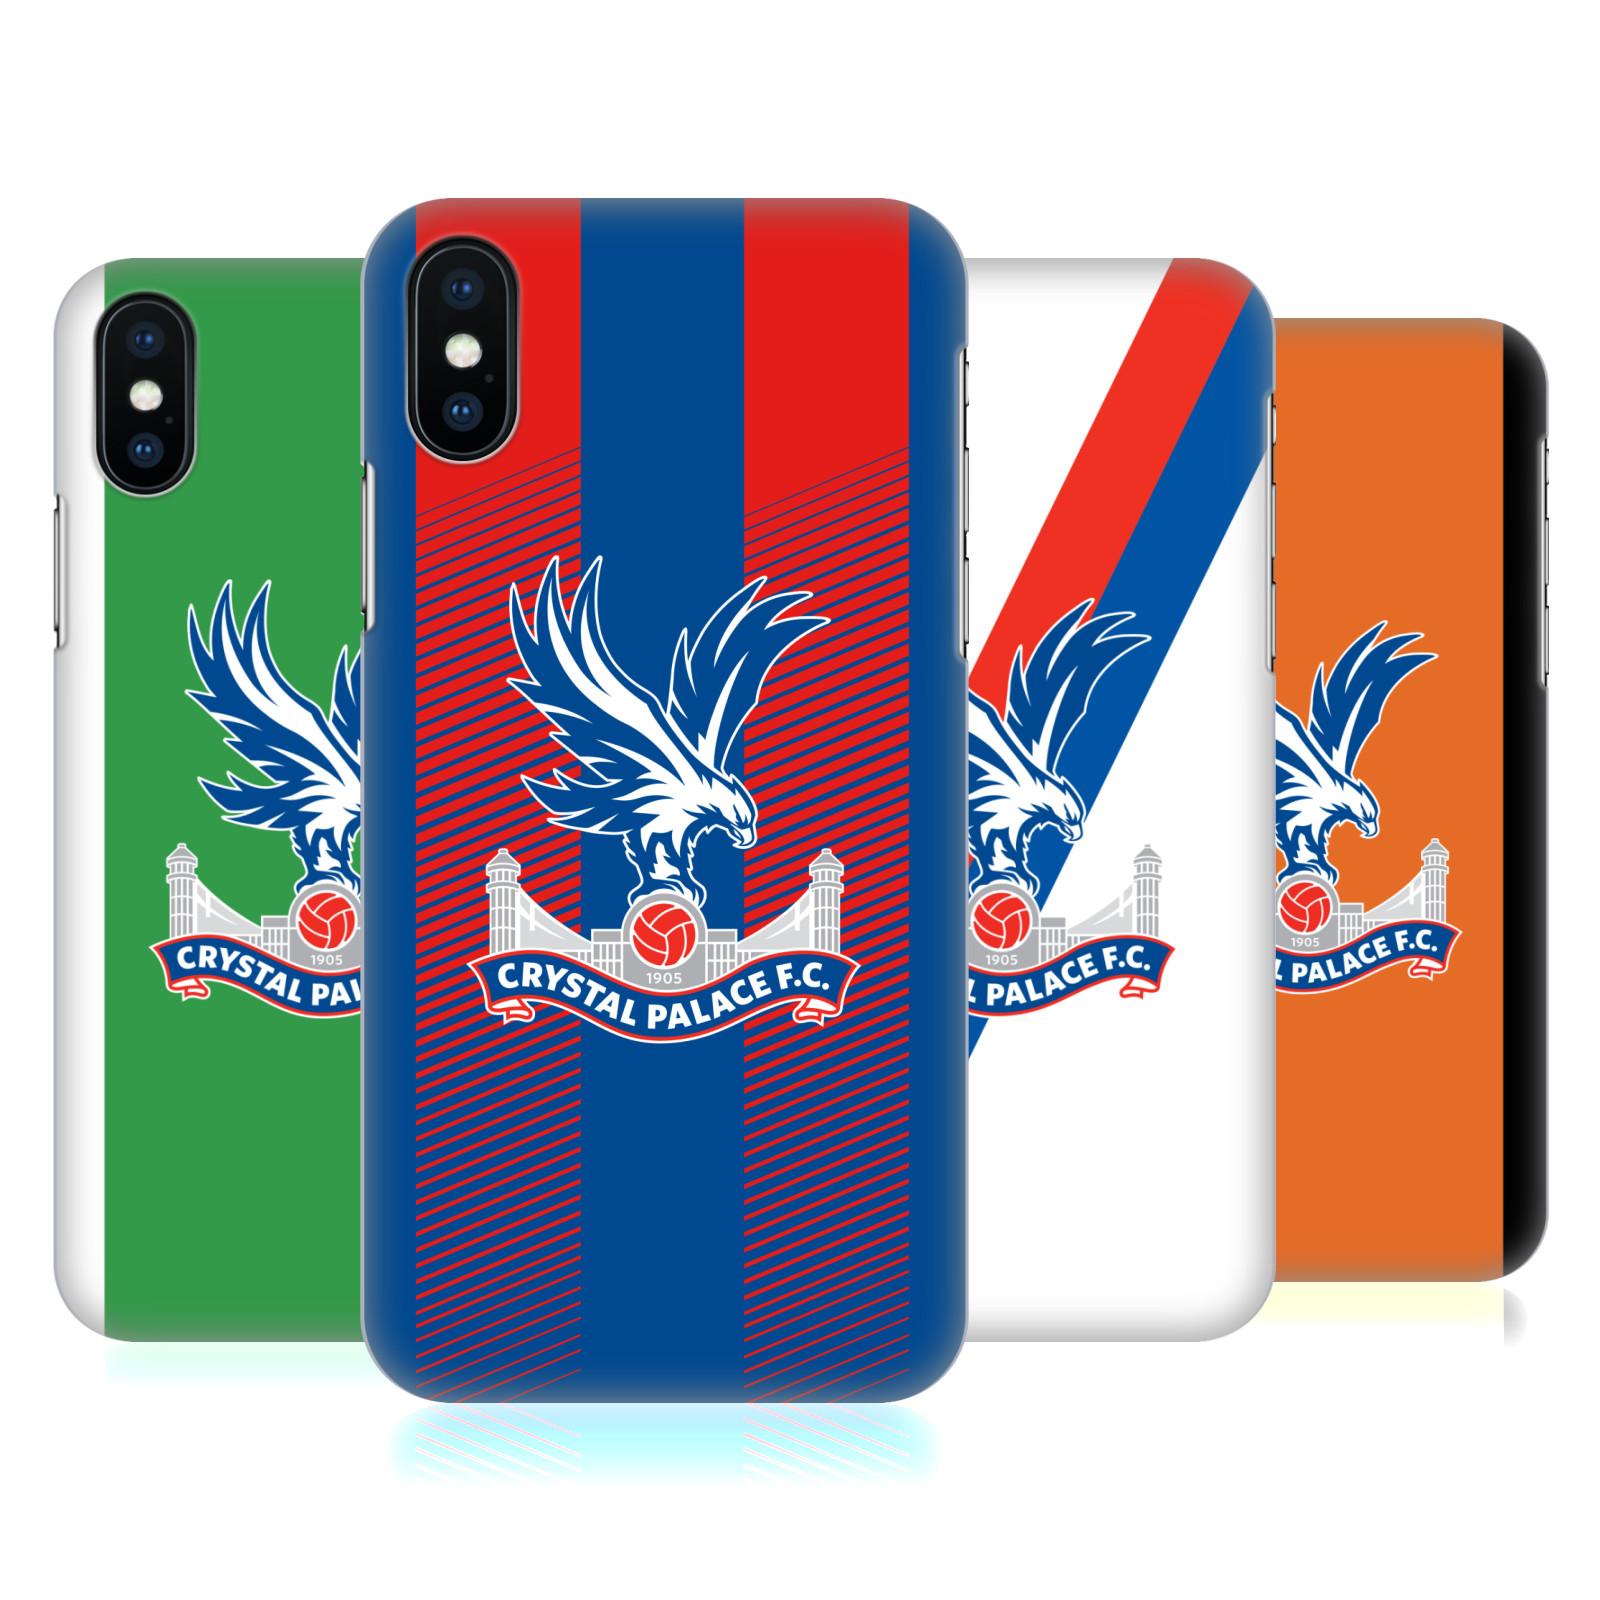 Crystal Palace FC 2018/19 Players Kit